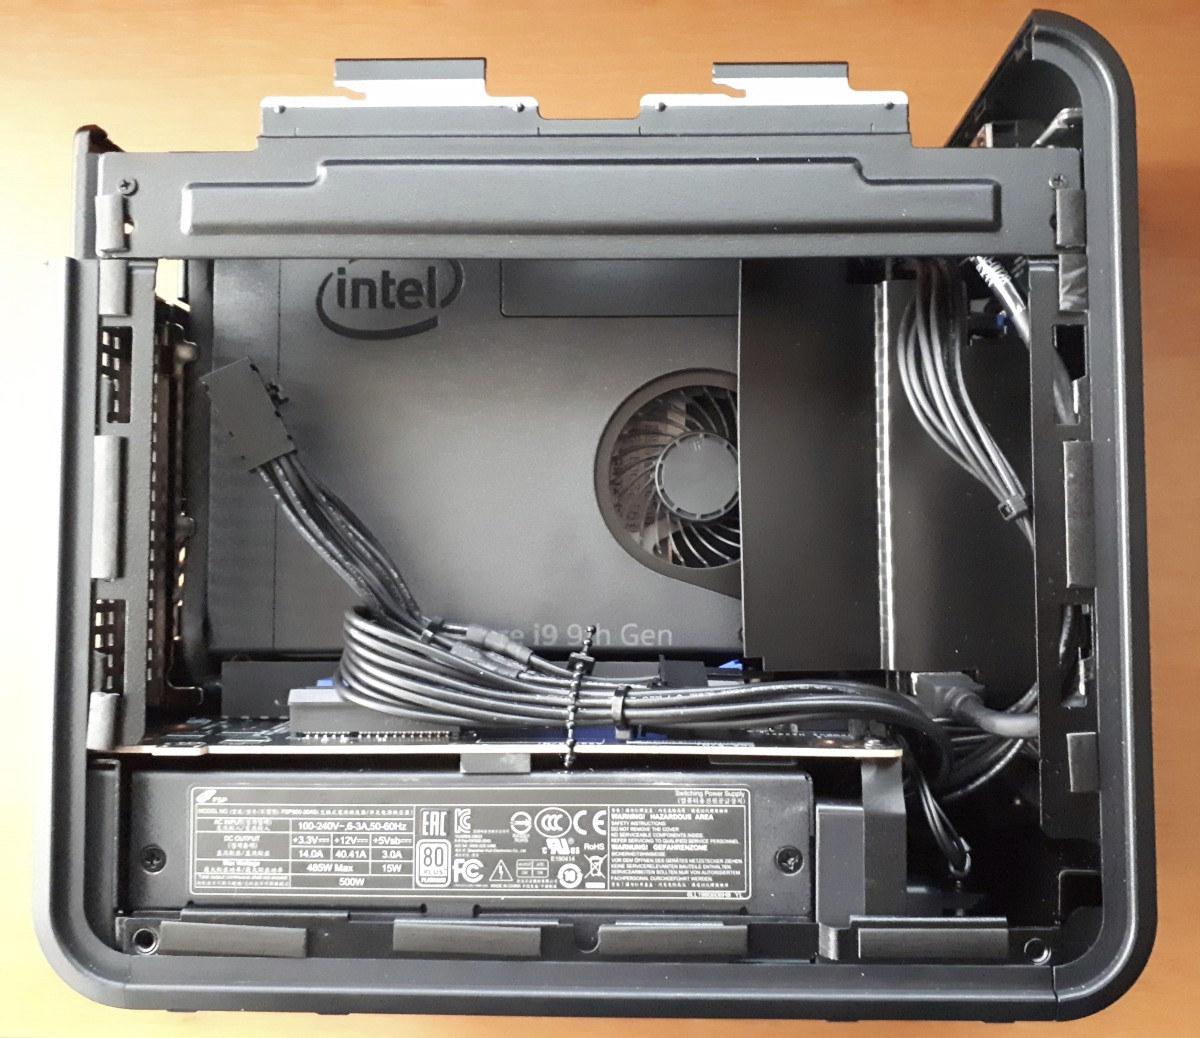 Intel NUC9 Kit